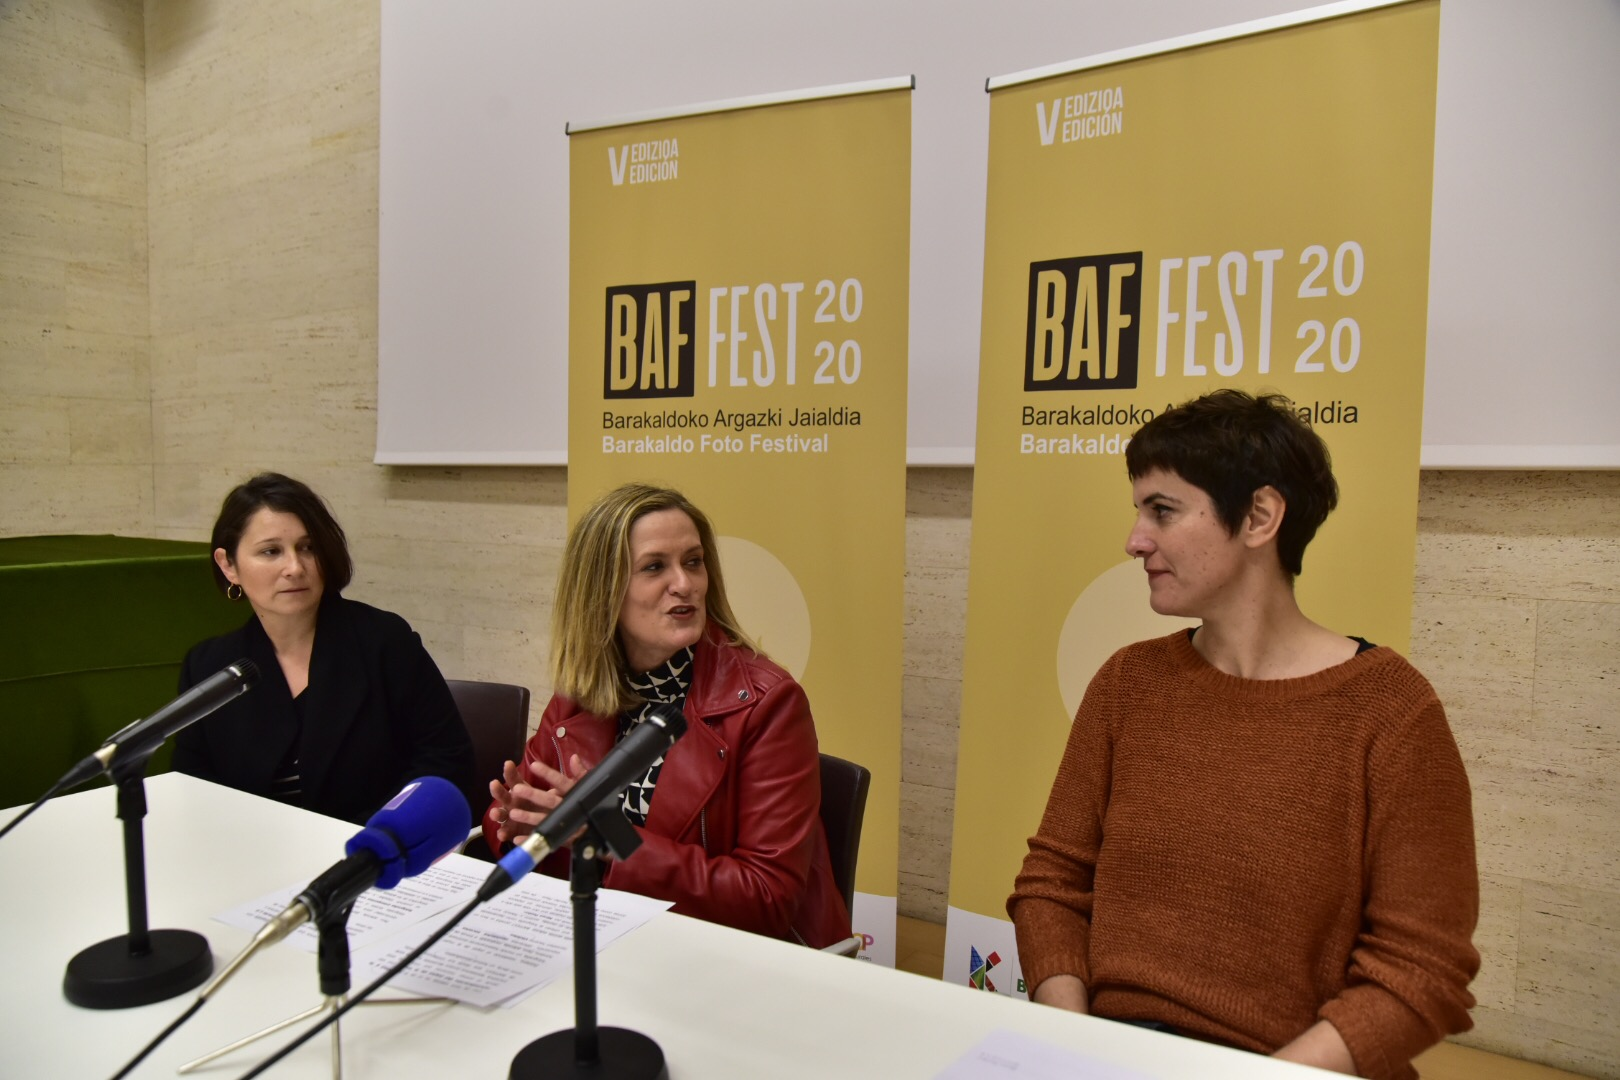 Presentación BAFFEST 2020